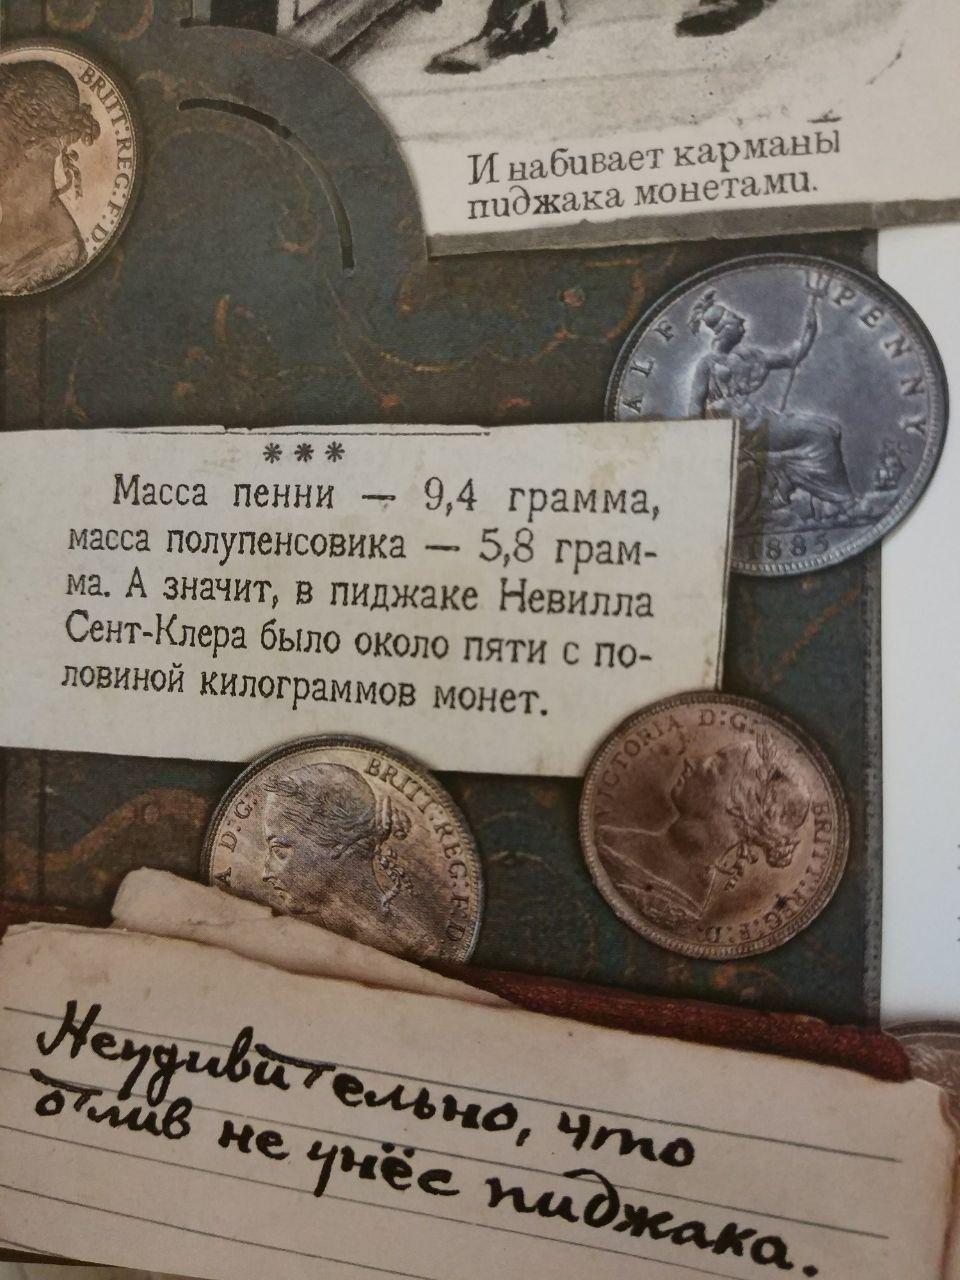 http://s3.uploads.ru/bcySA.jpg